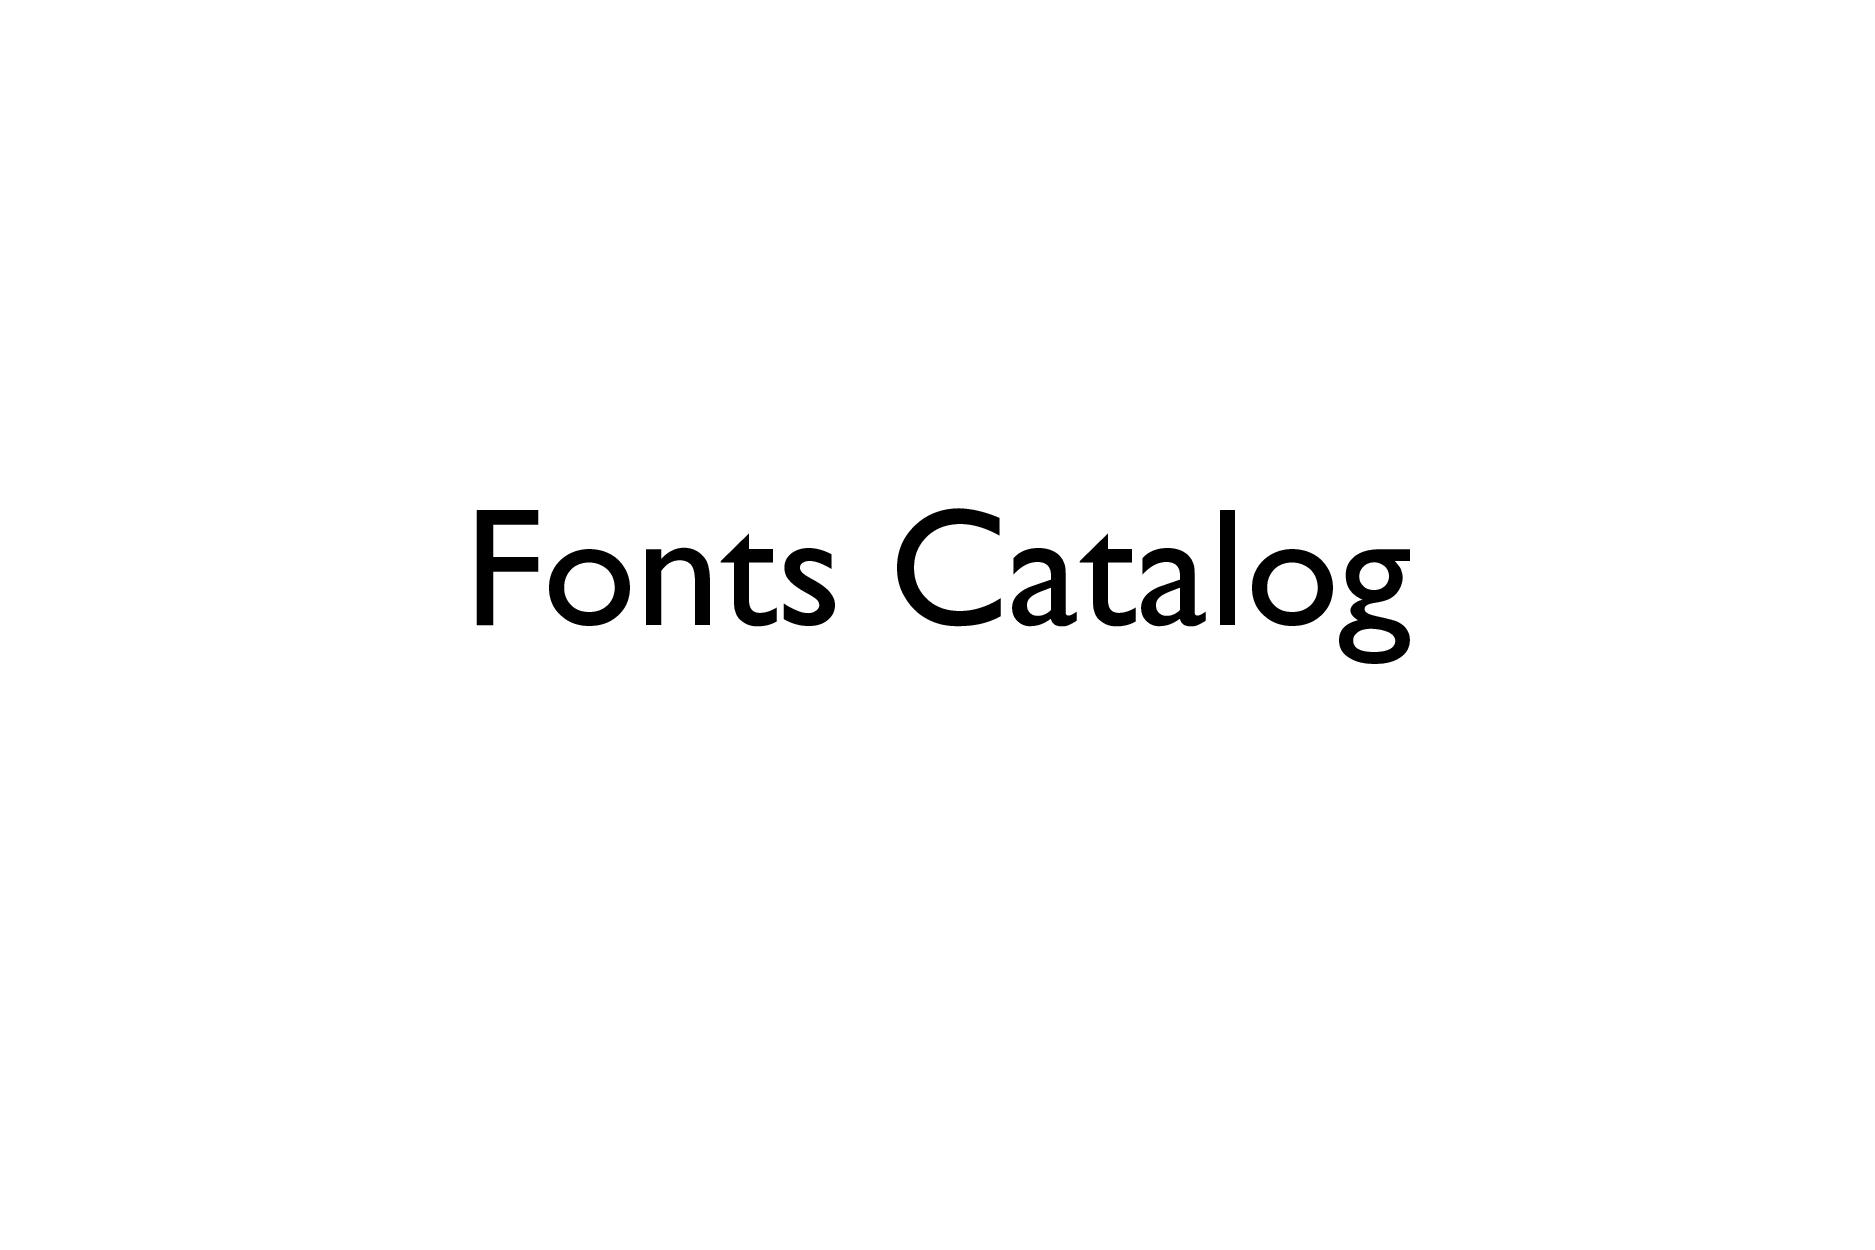 Fonts Catalog